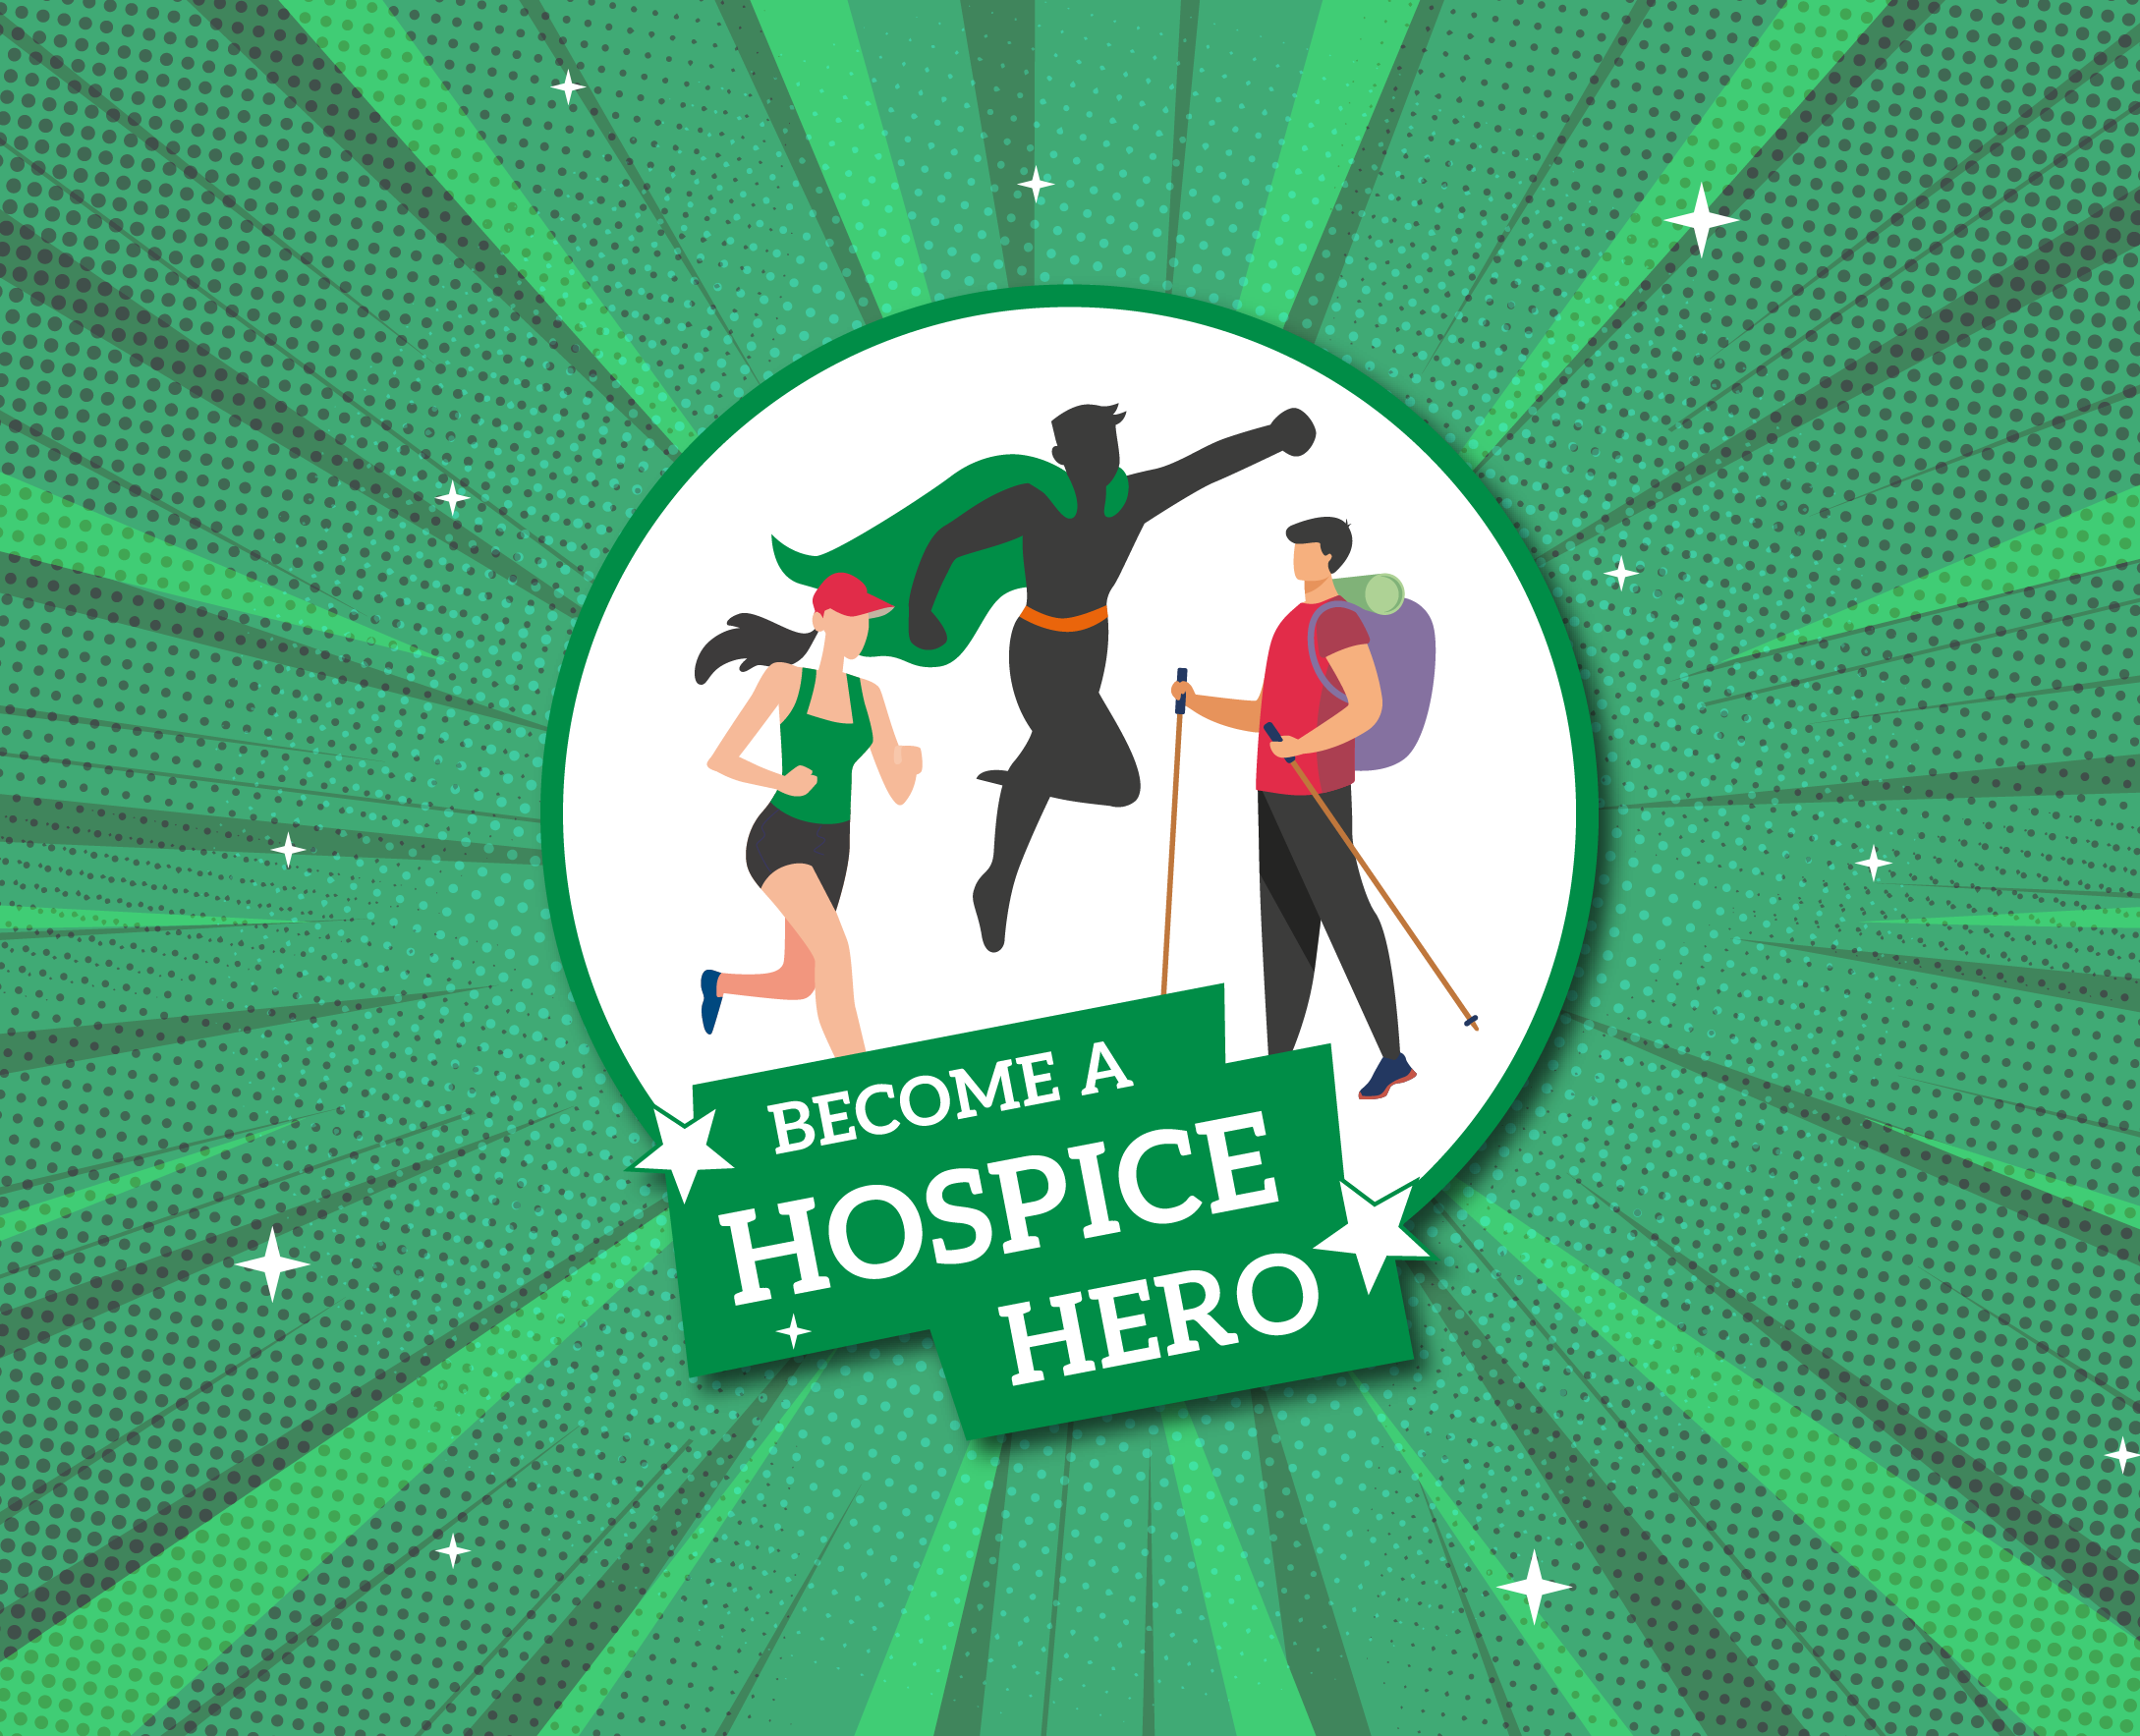 Comic book style hero badge